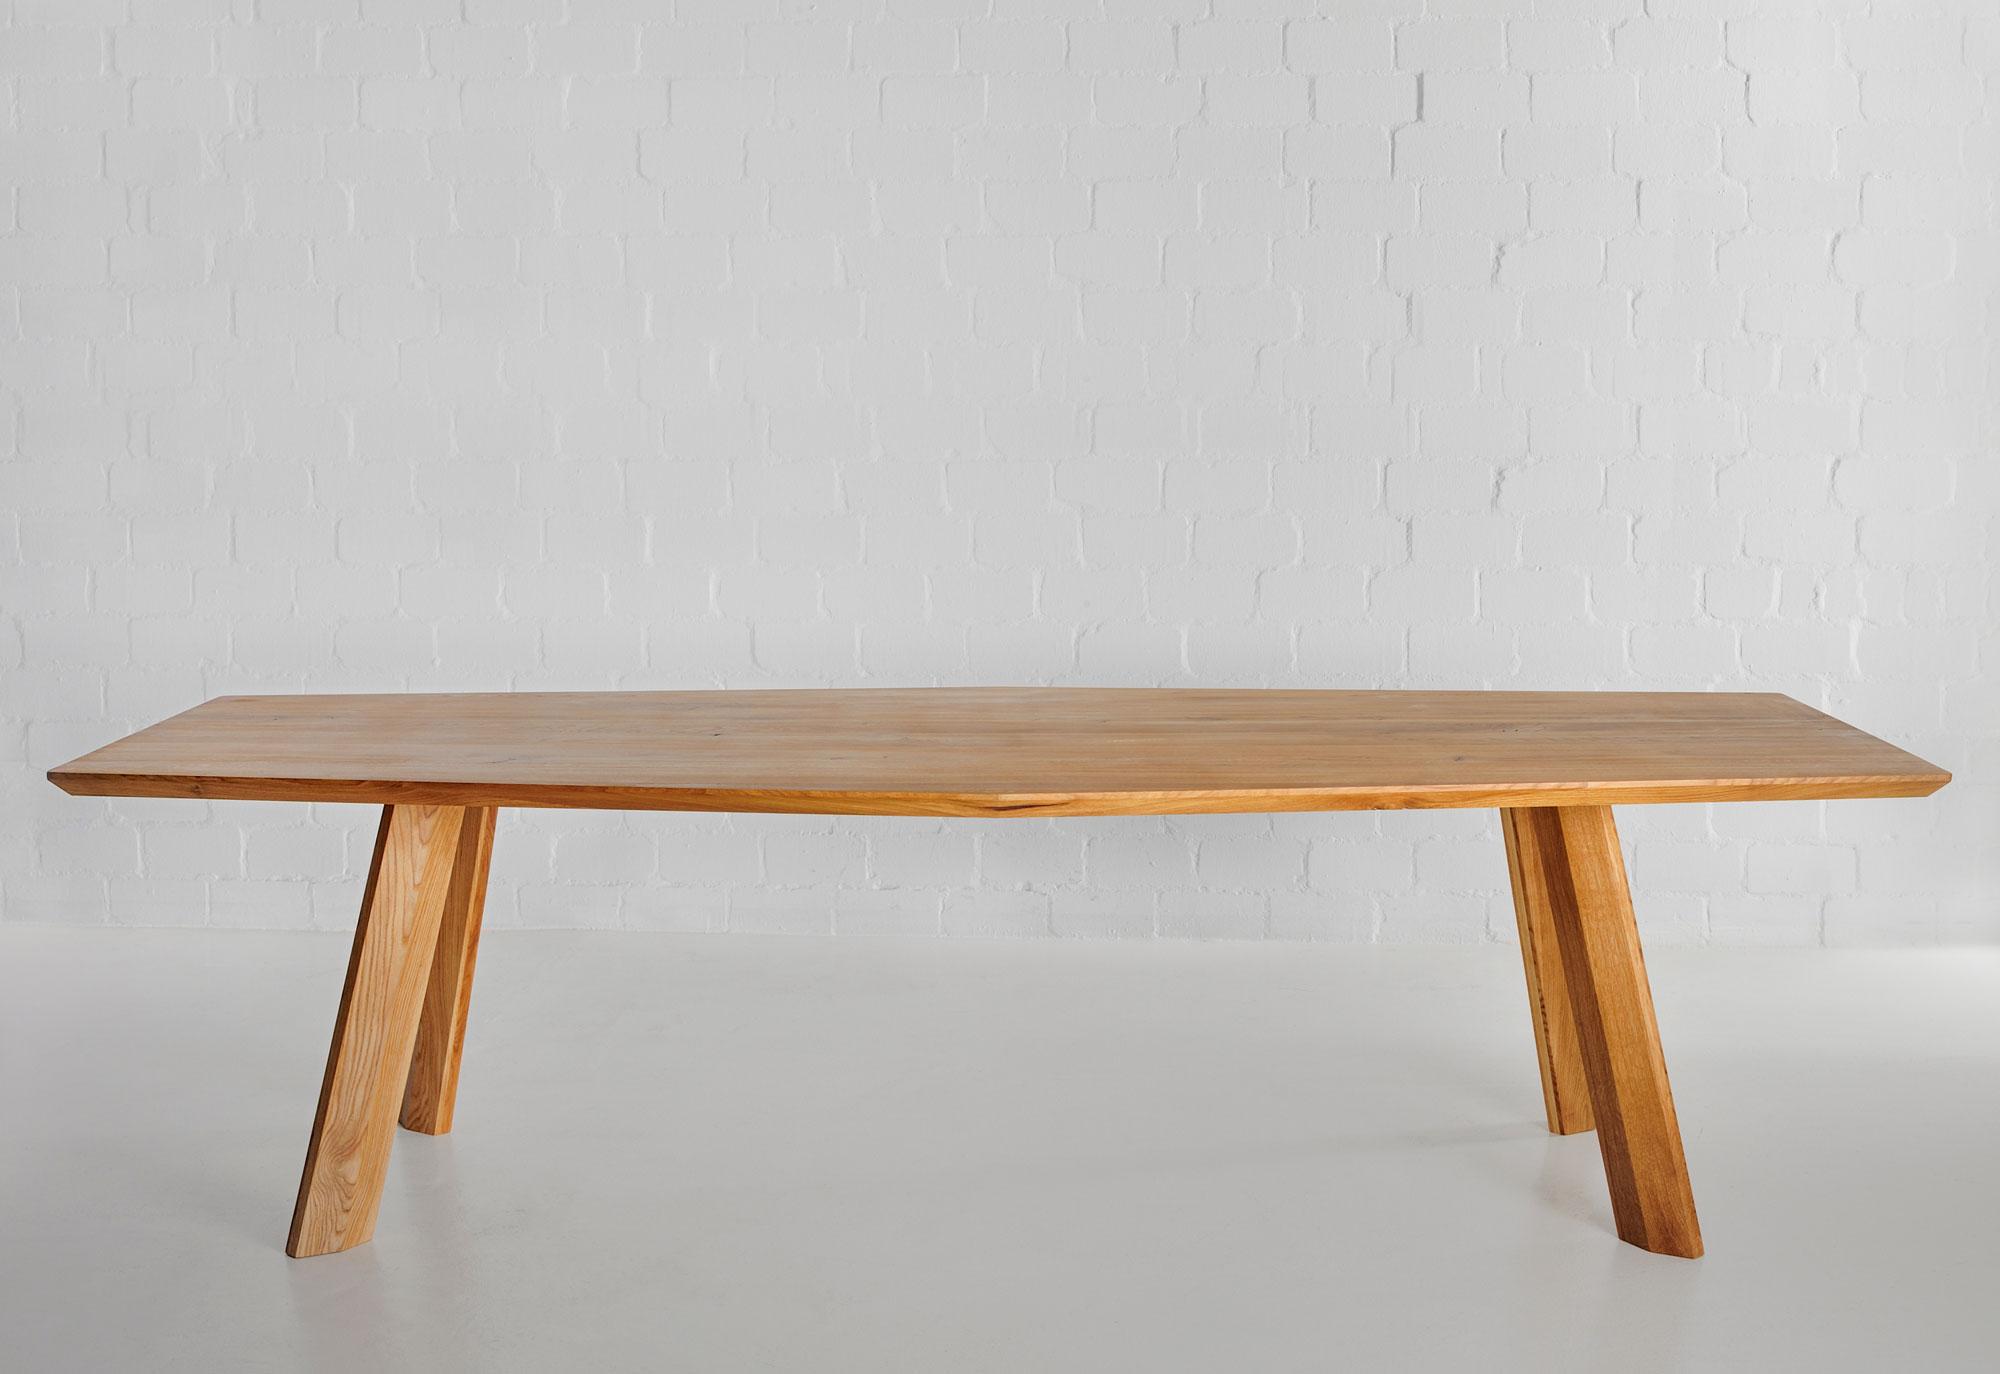 Designer Dining Table RHOMBI Custom Made In Solid Wood By Vitamin Design